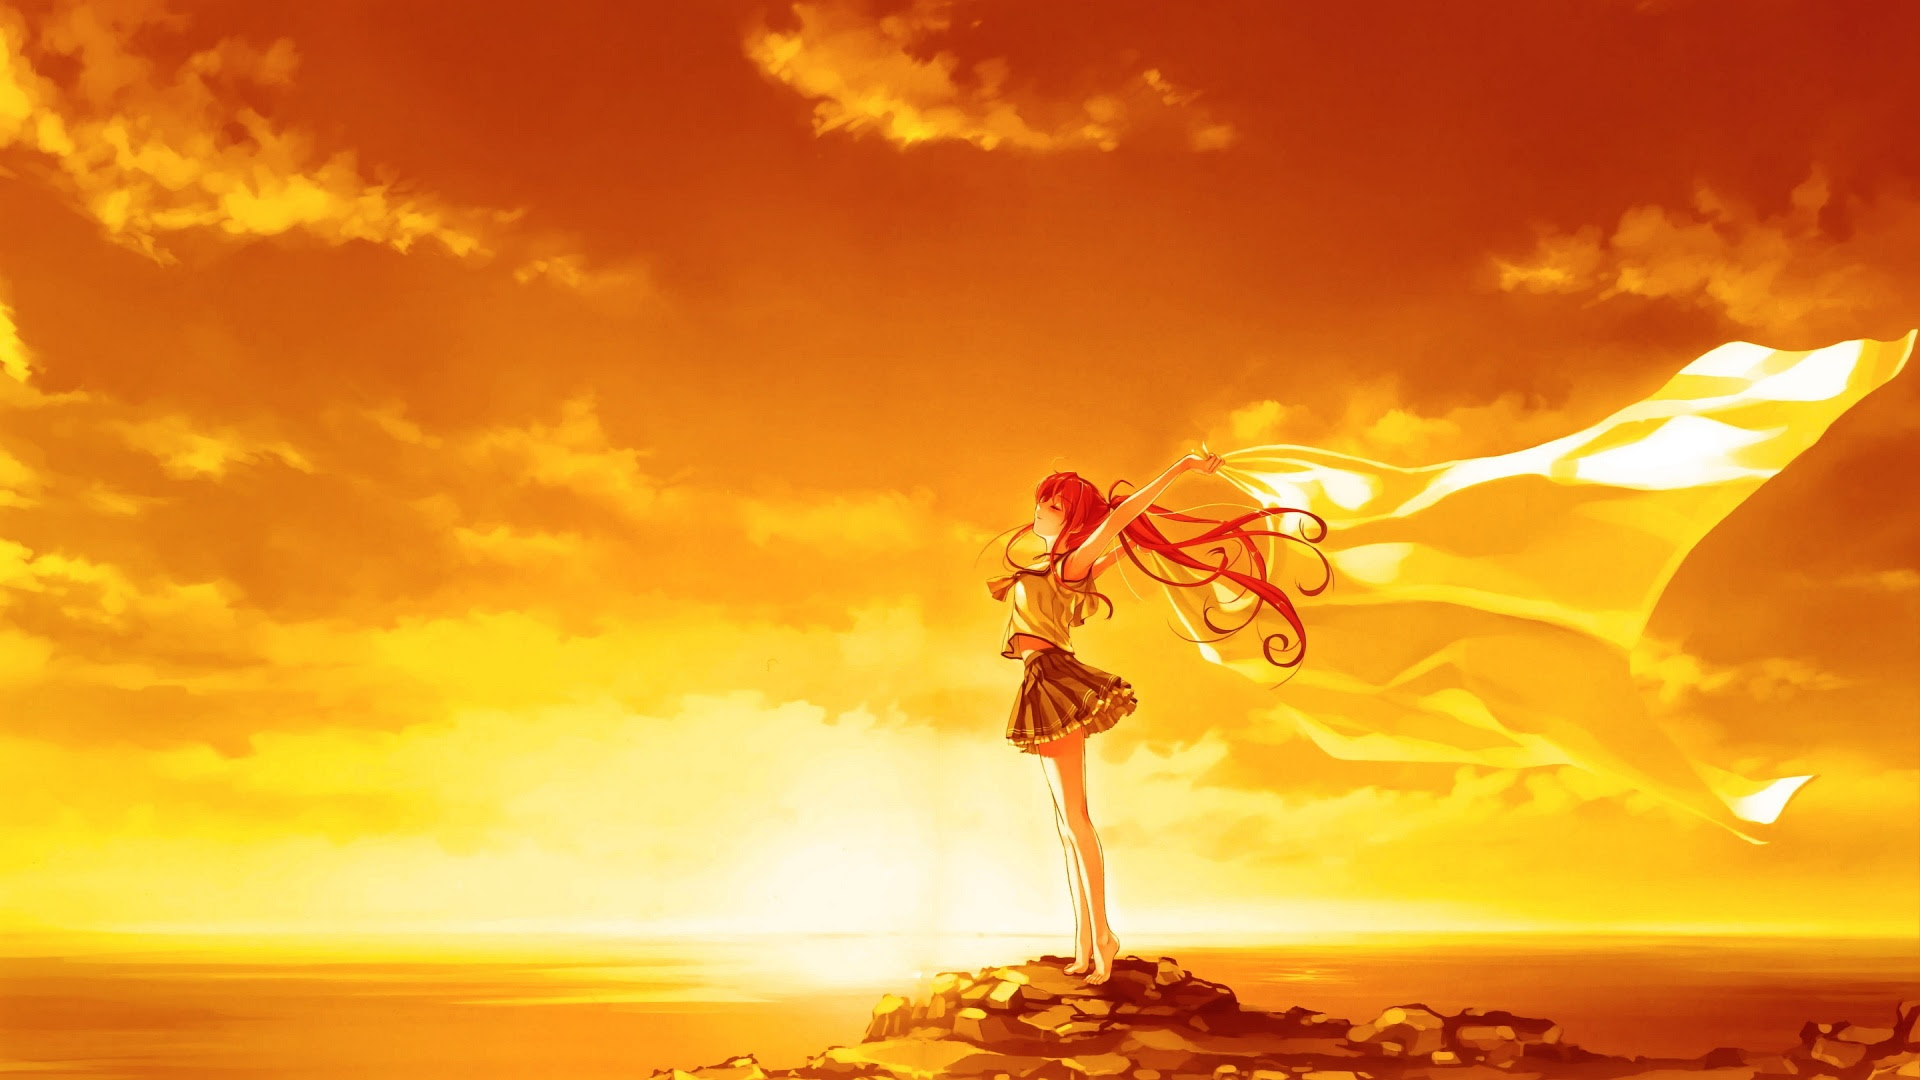 Donload Free 1920×1080 Anime Backgrounds | PixelsTalk.Net